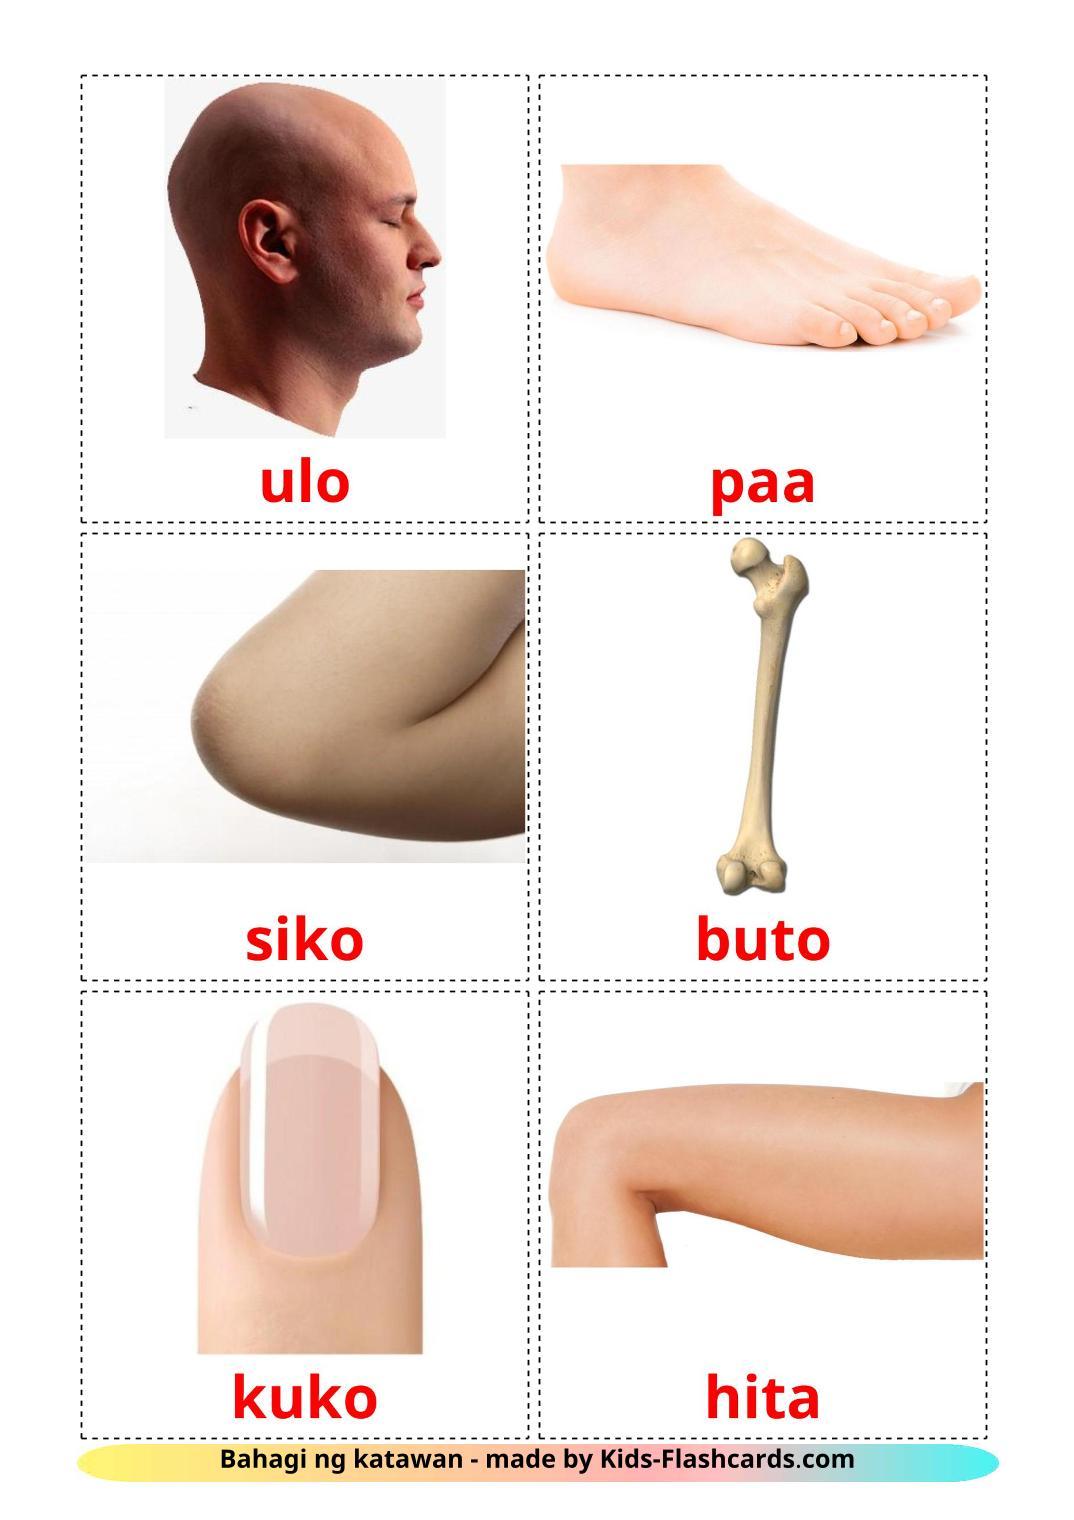 Body Parts - 26 Free Printable filipino Flashcards